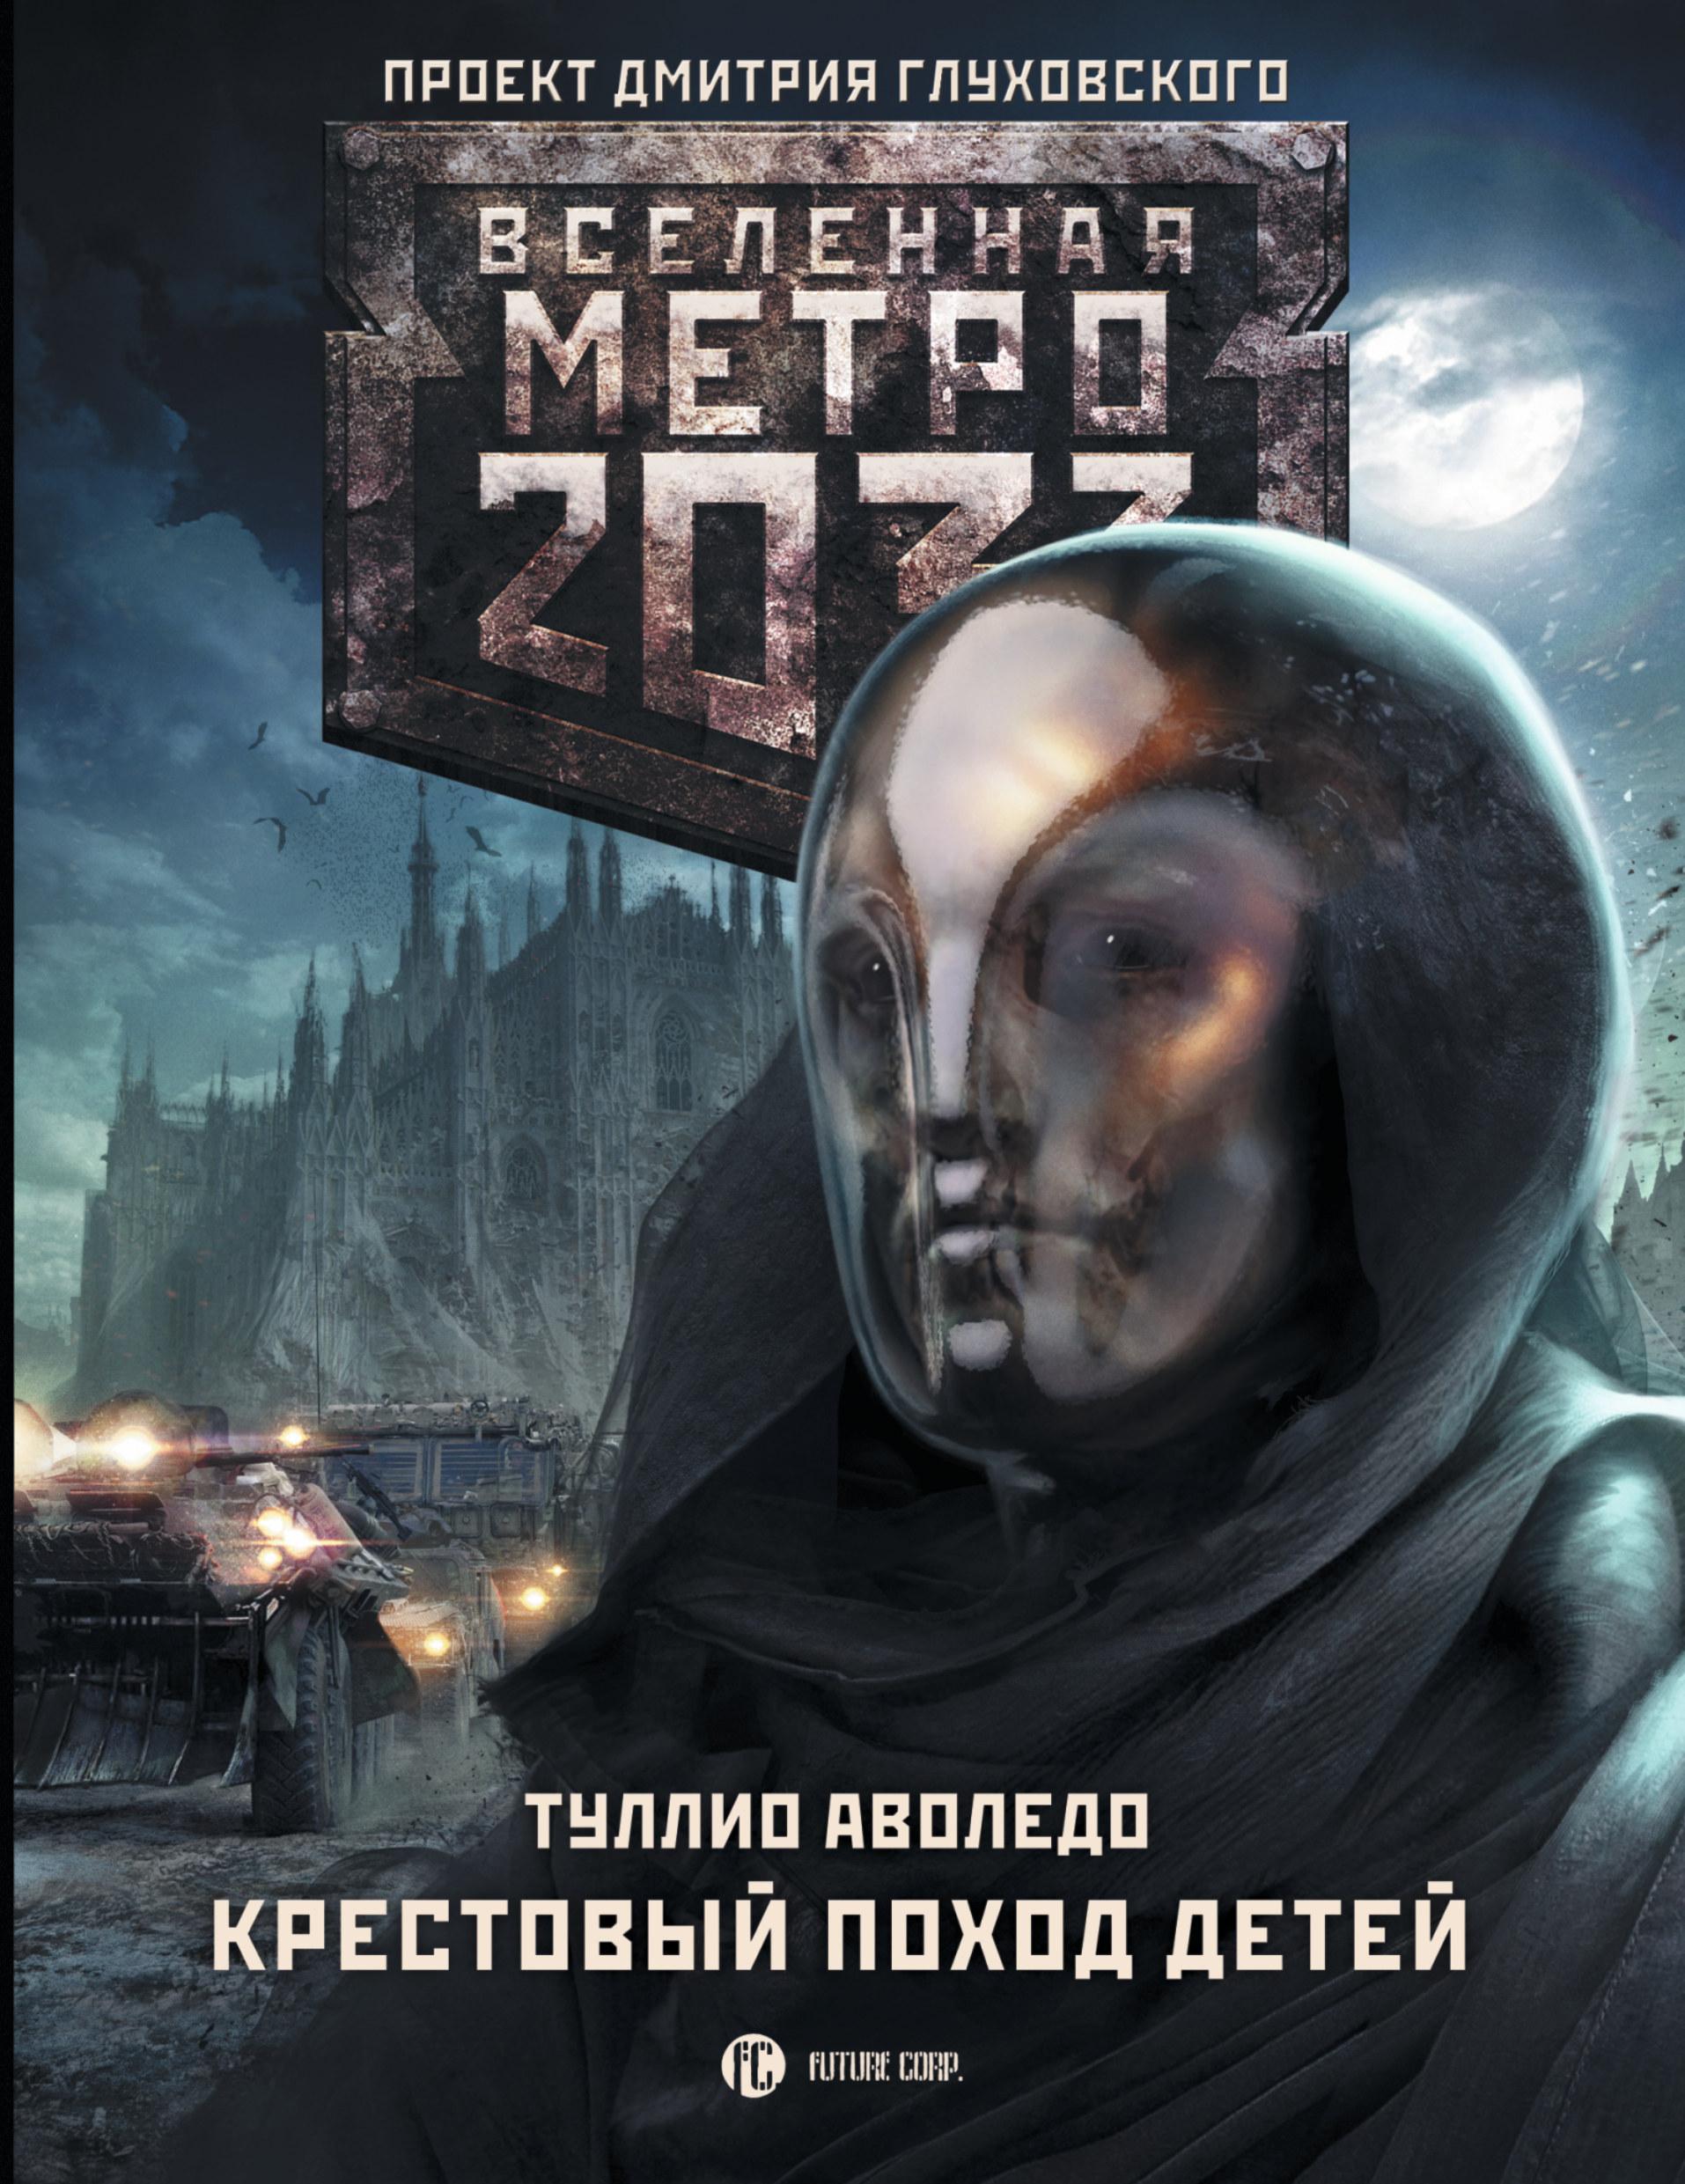 Аволедо Т. Метро 2033: Крестовый поход детей харитонов ю в метро 2033 на краю пропасти